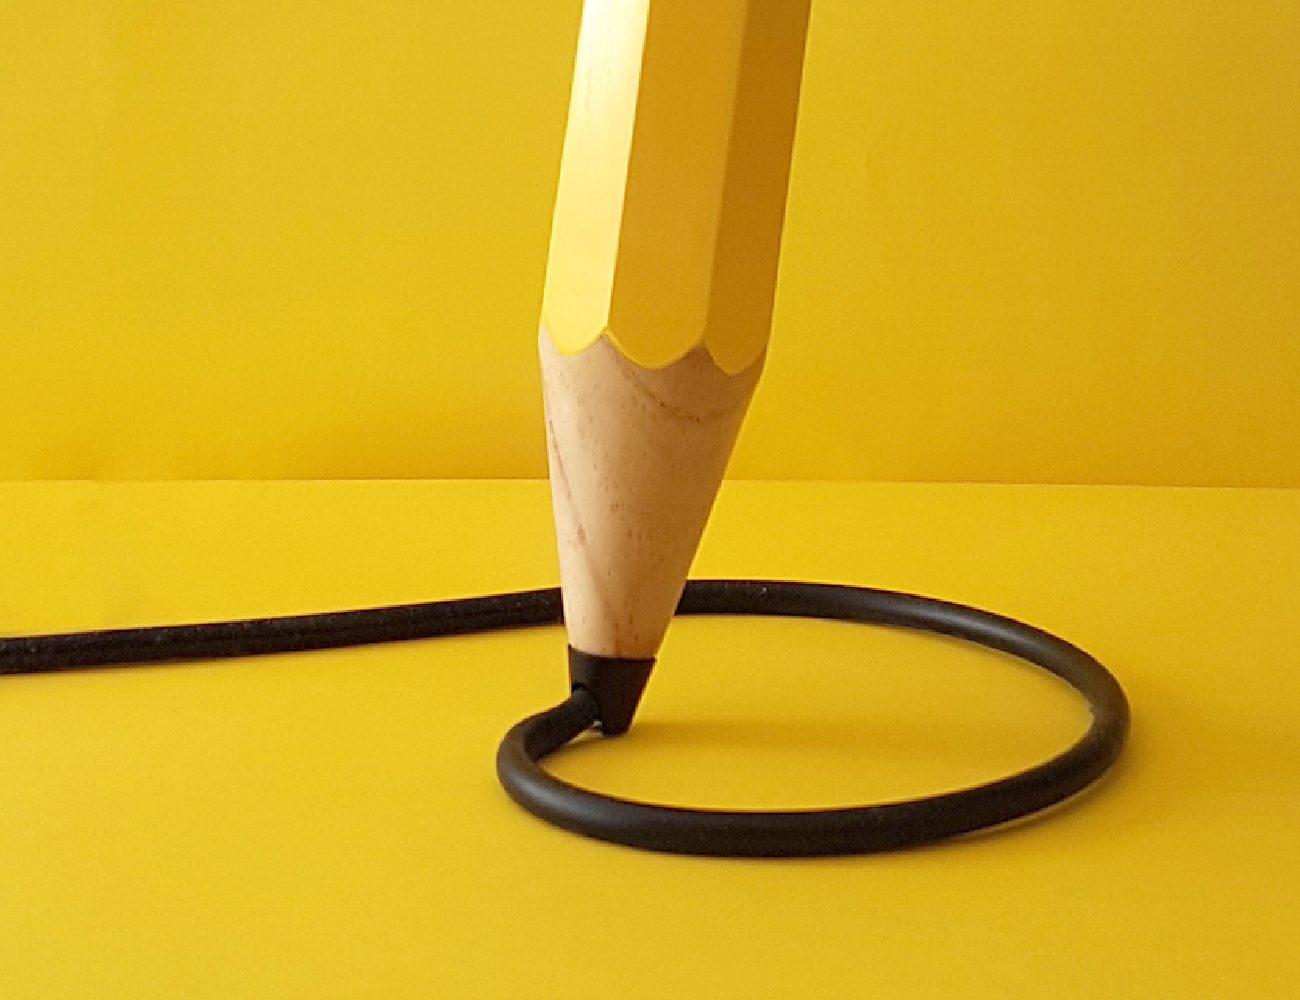 Drew the Pencil Lamp